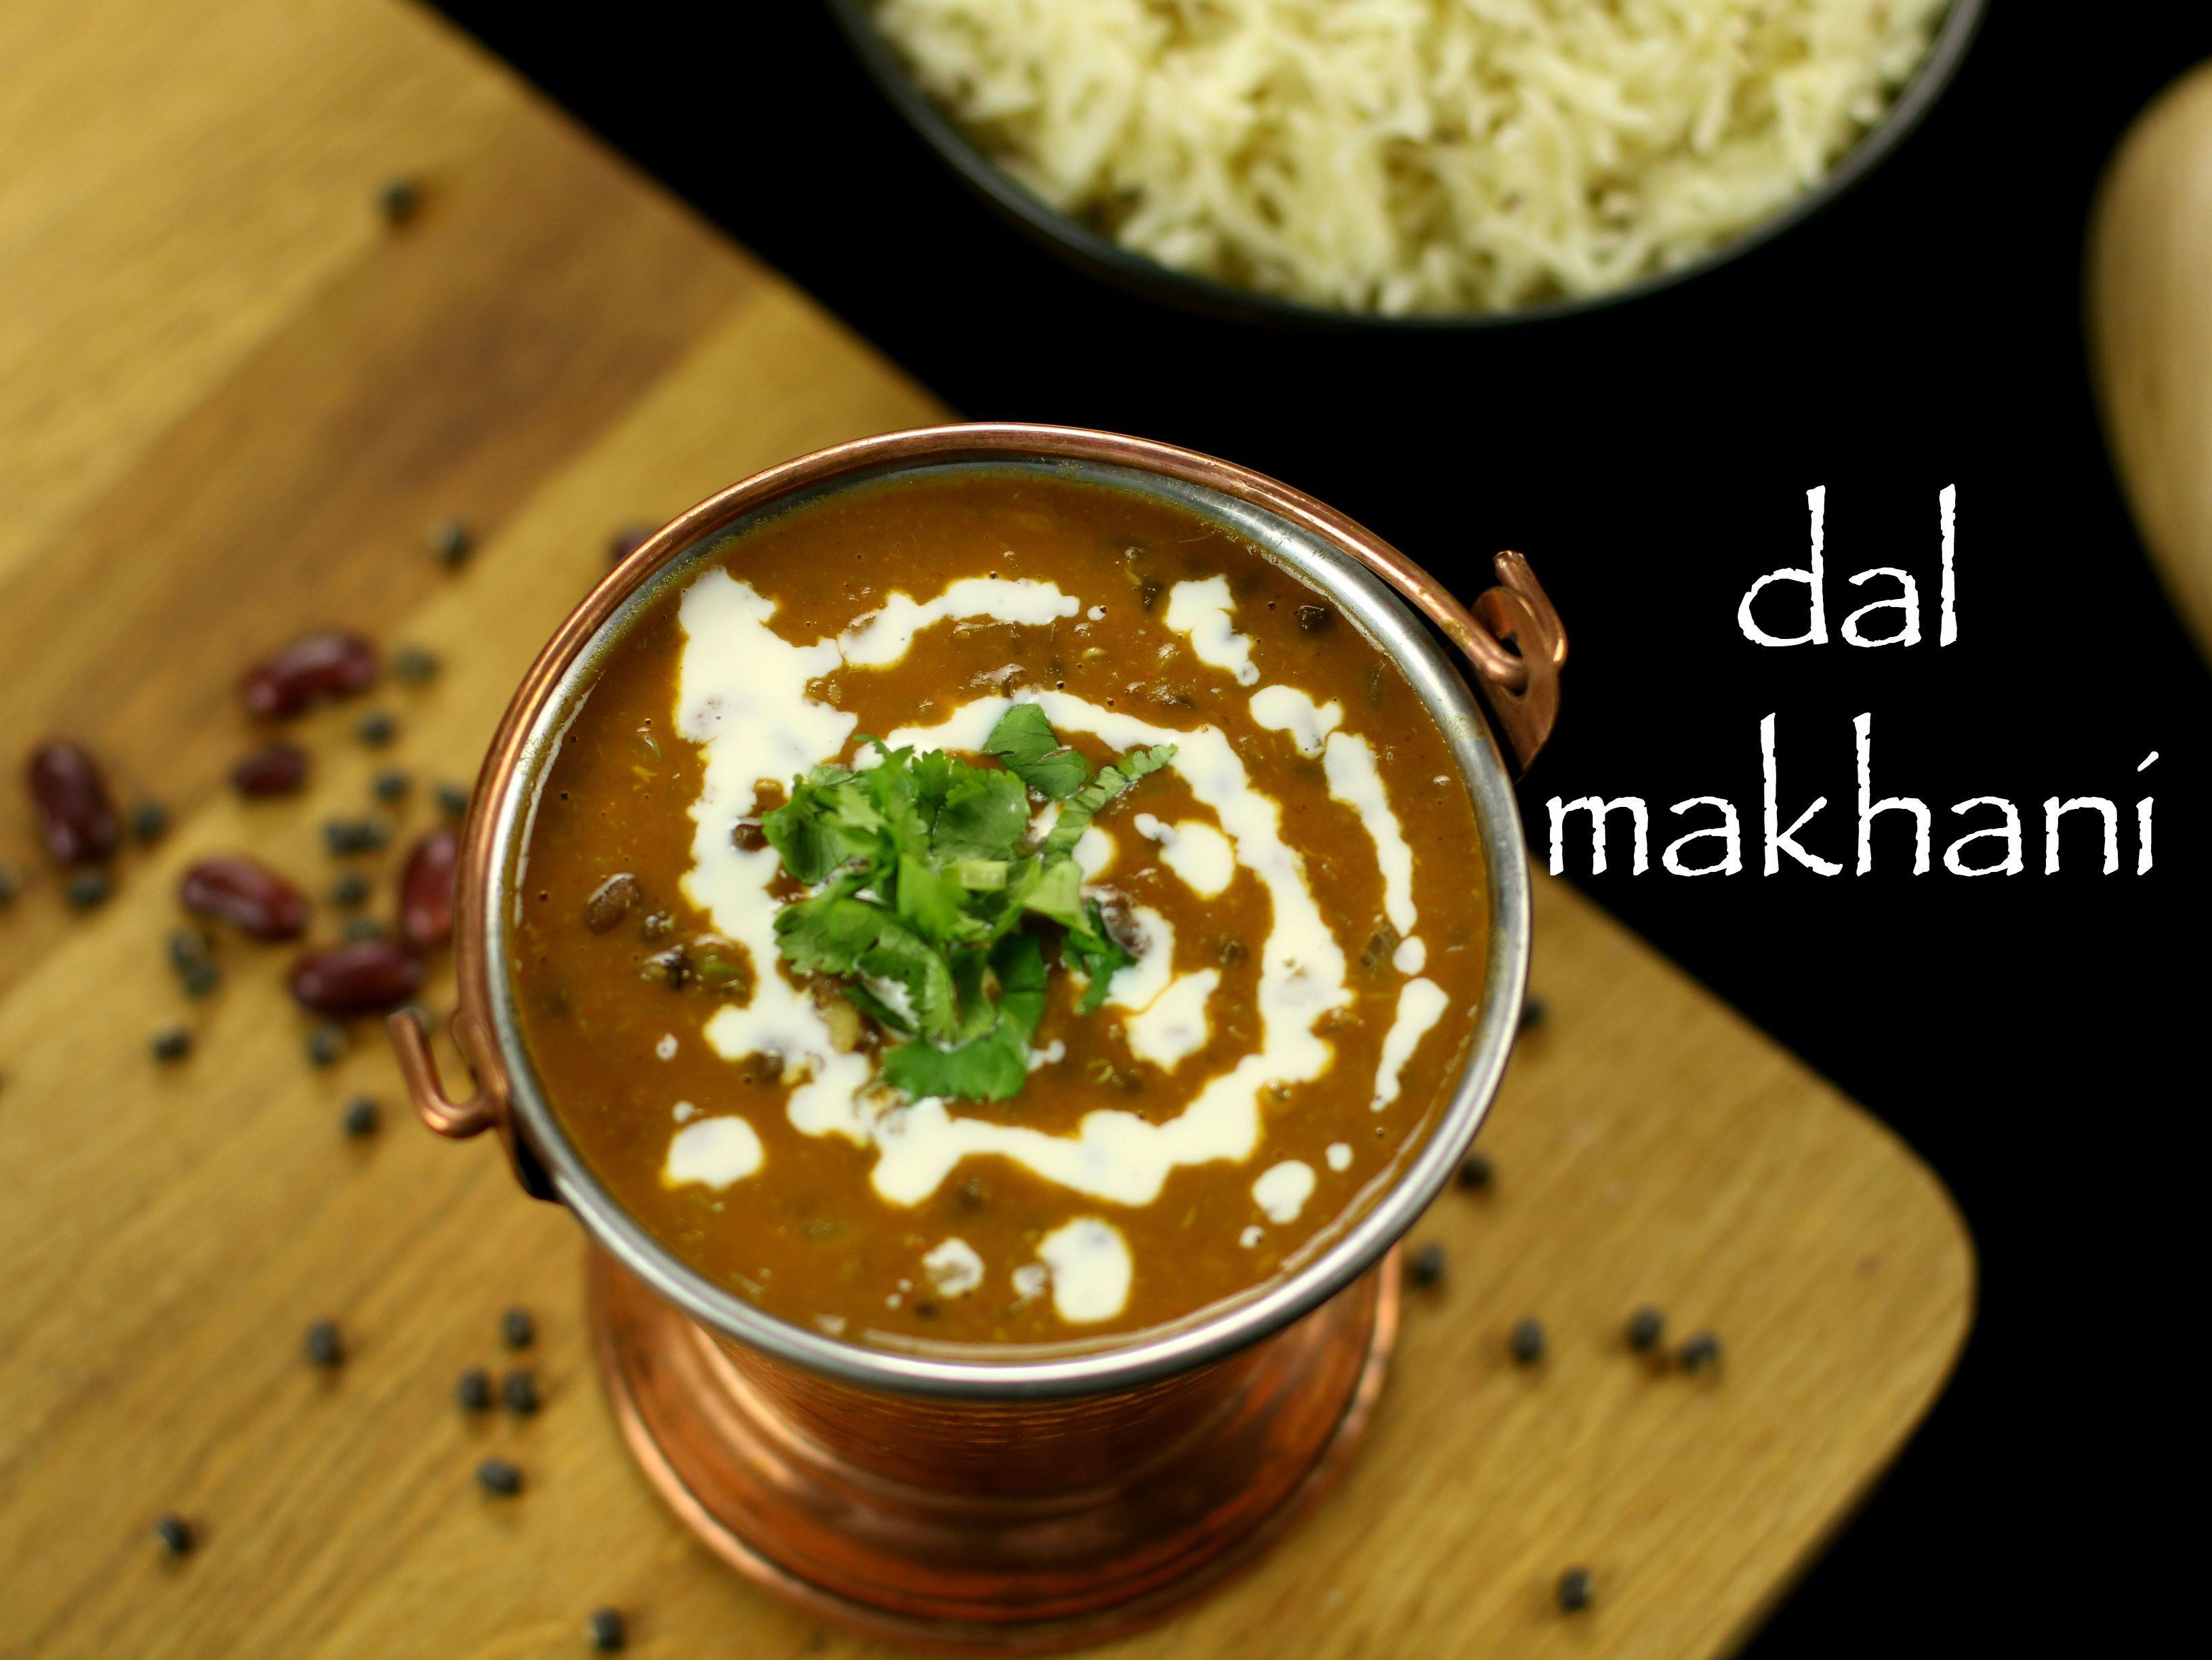 Dal makhani recipe restaurant style dal makhani recipe with step dal makhani recipe restaurant style dal makhani recipe with step by step photovideo forumfinder Gallery